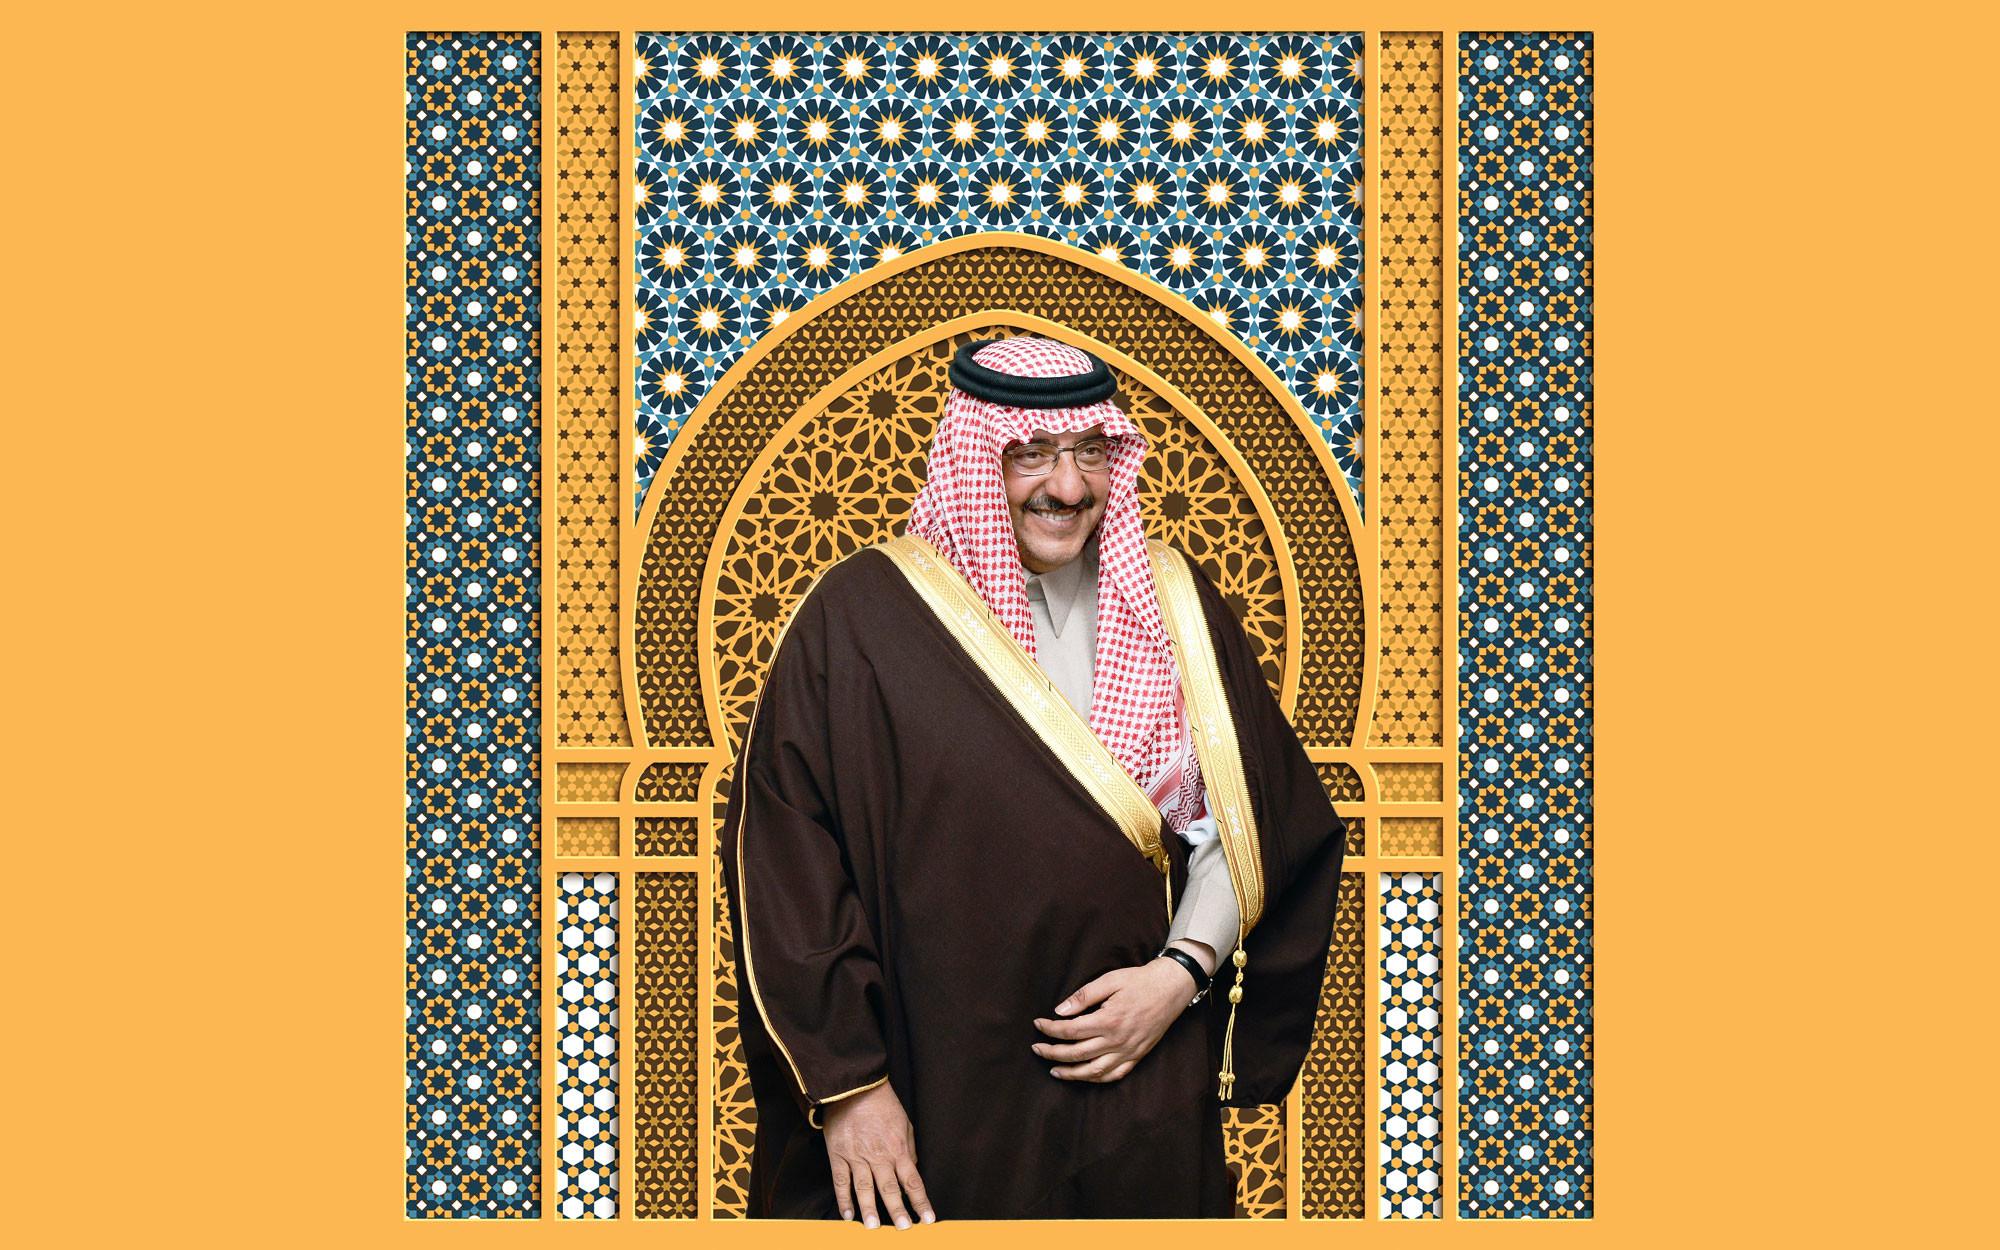 Принц Мухаммад ибн Наиф. Коллаж © L!FE Фото: © Shutterstock.com